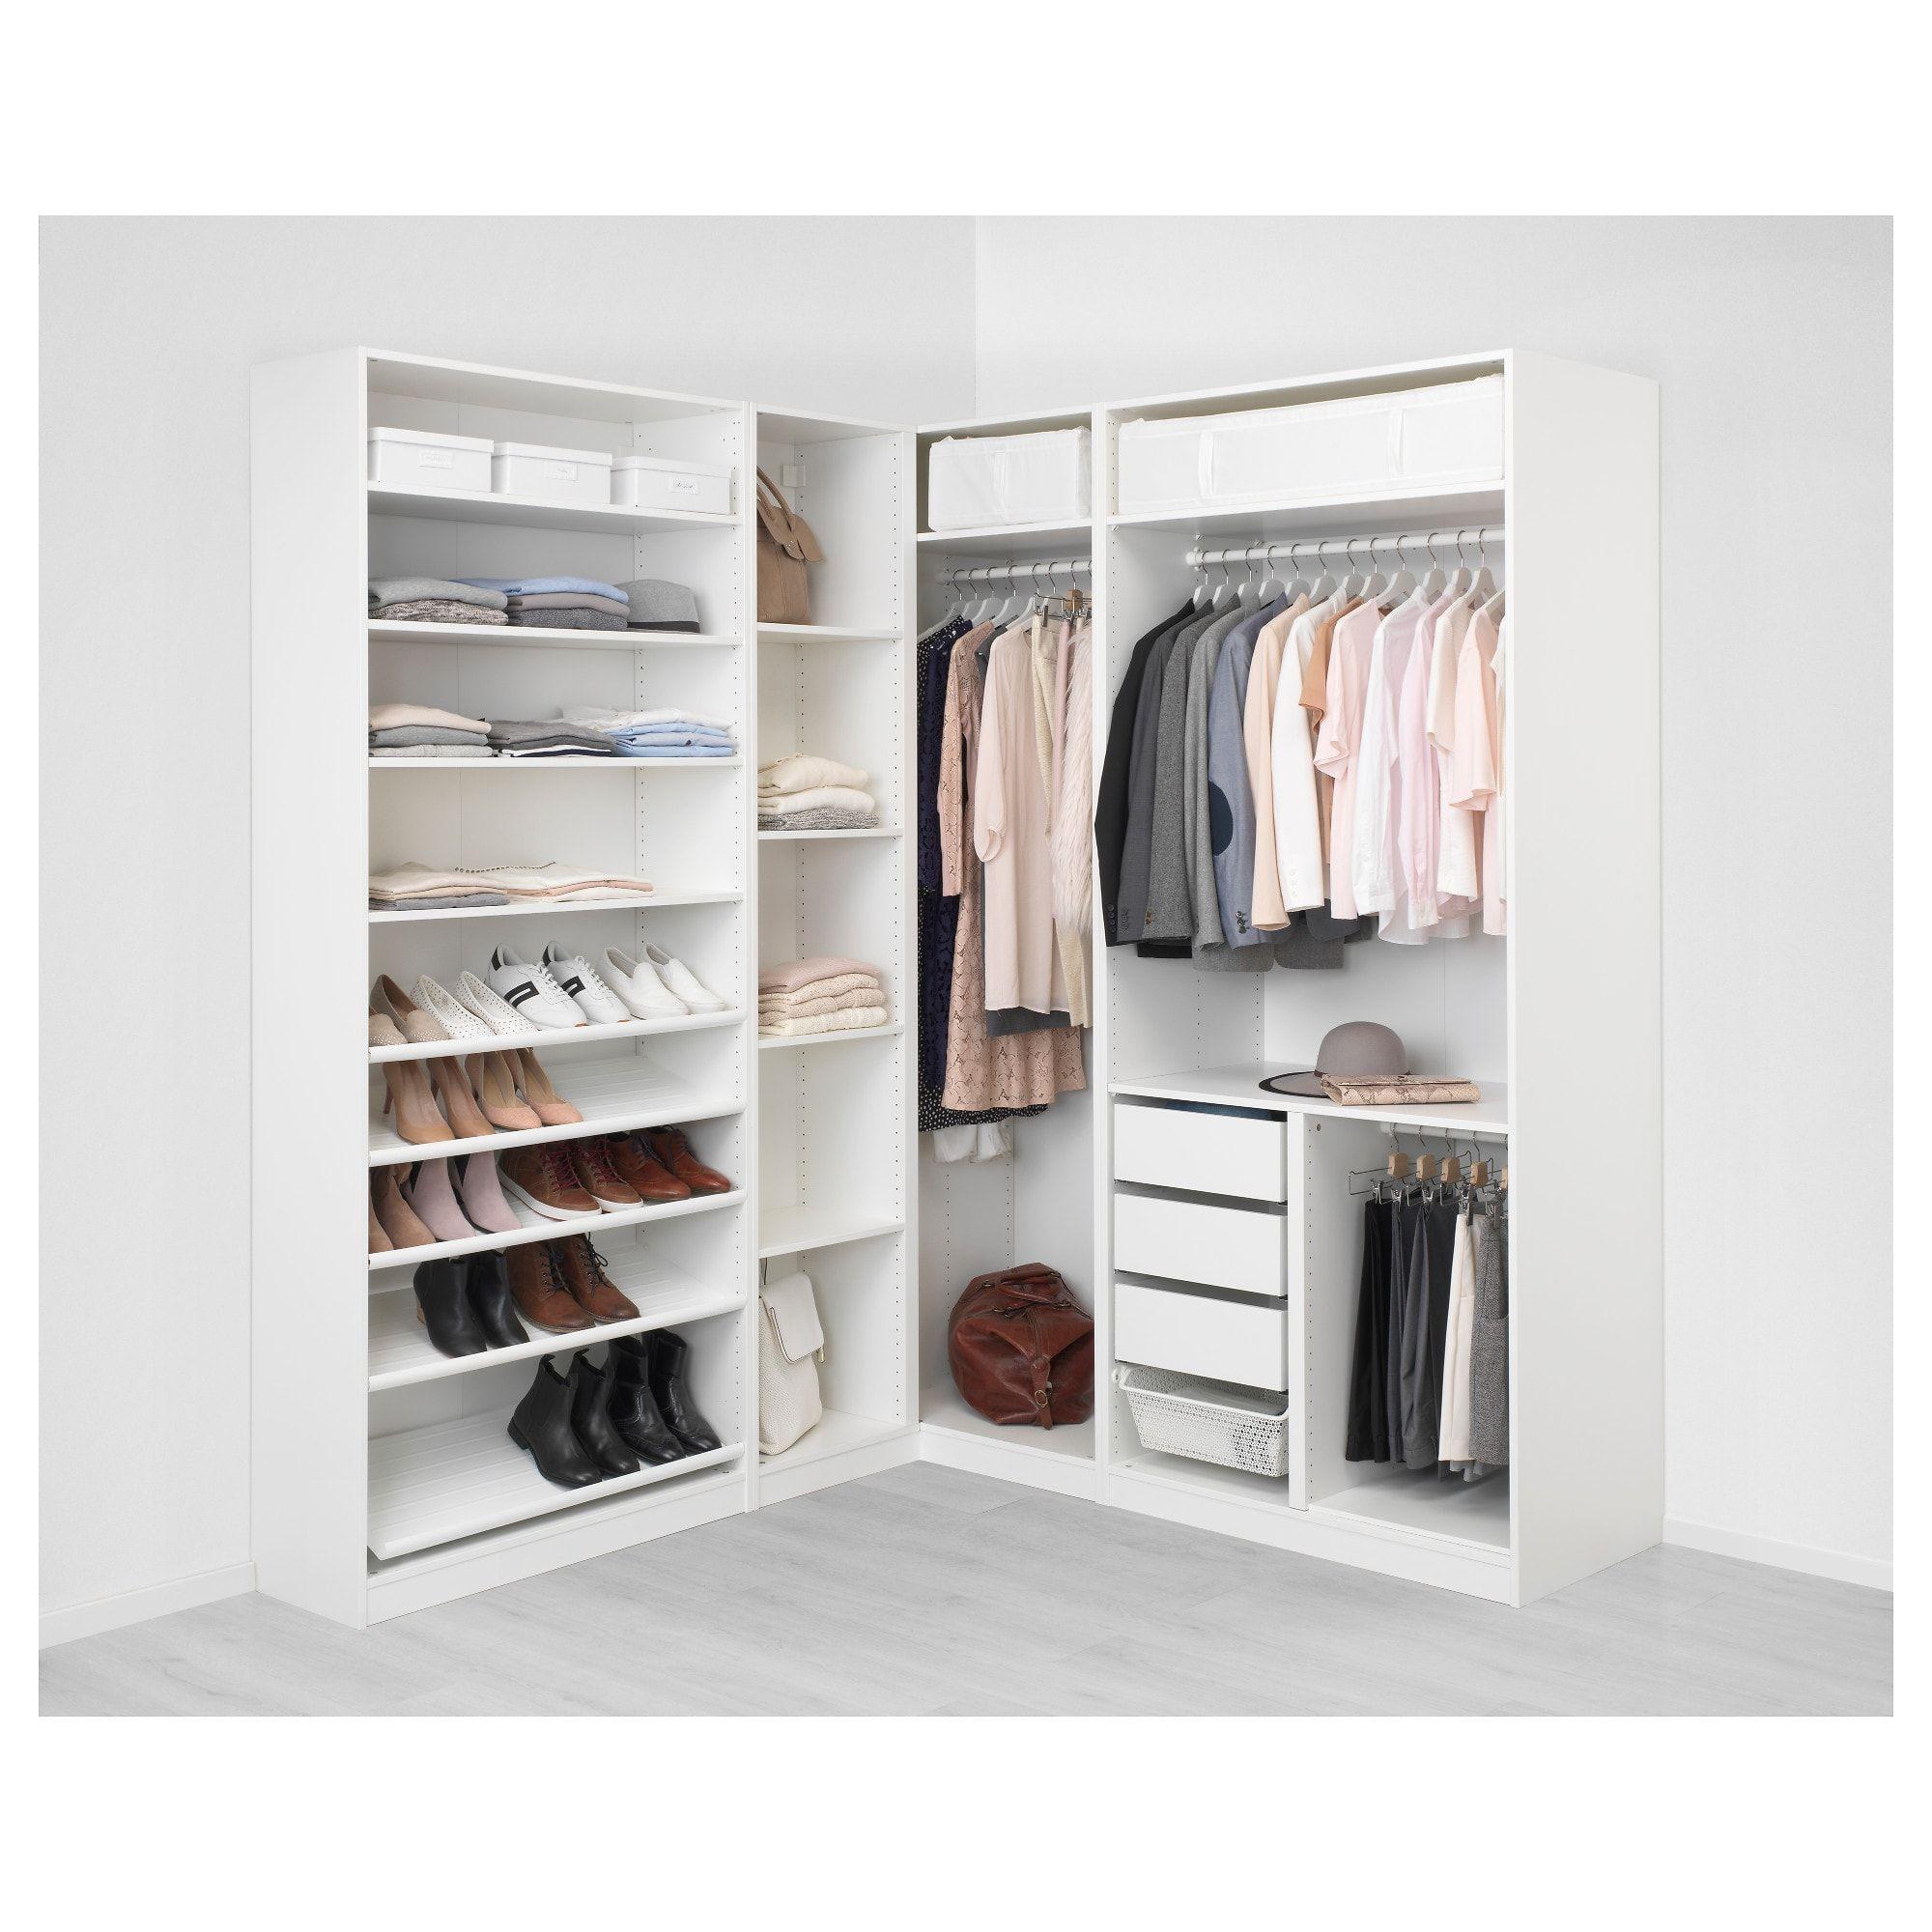 PAX Corner wardrobe white Tyssedal, Tyssedal glass 82 3